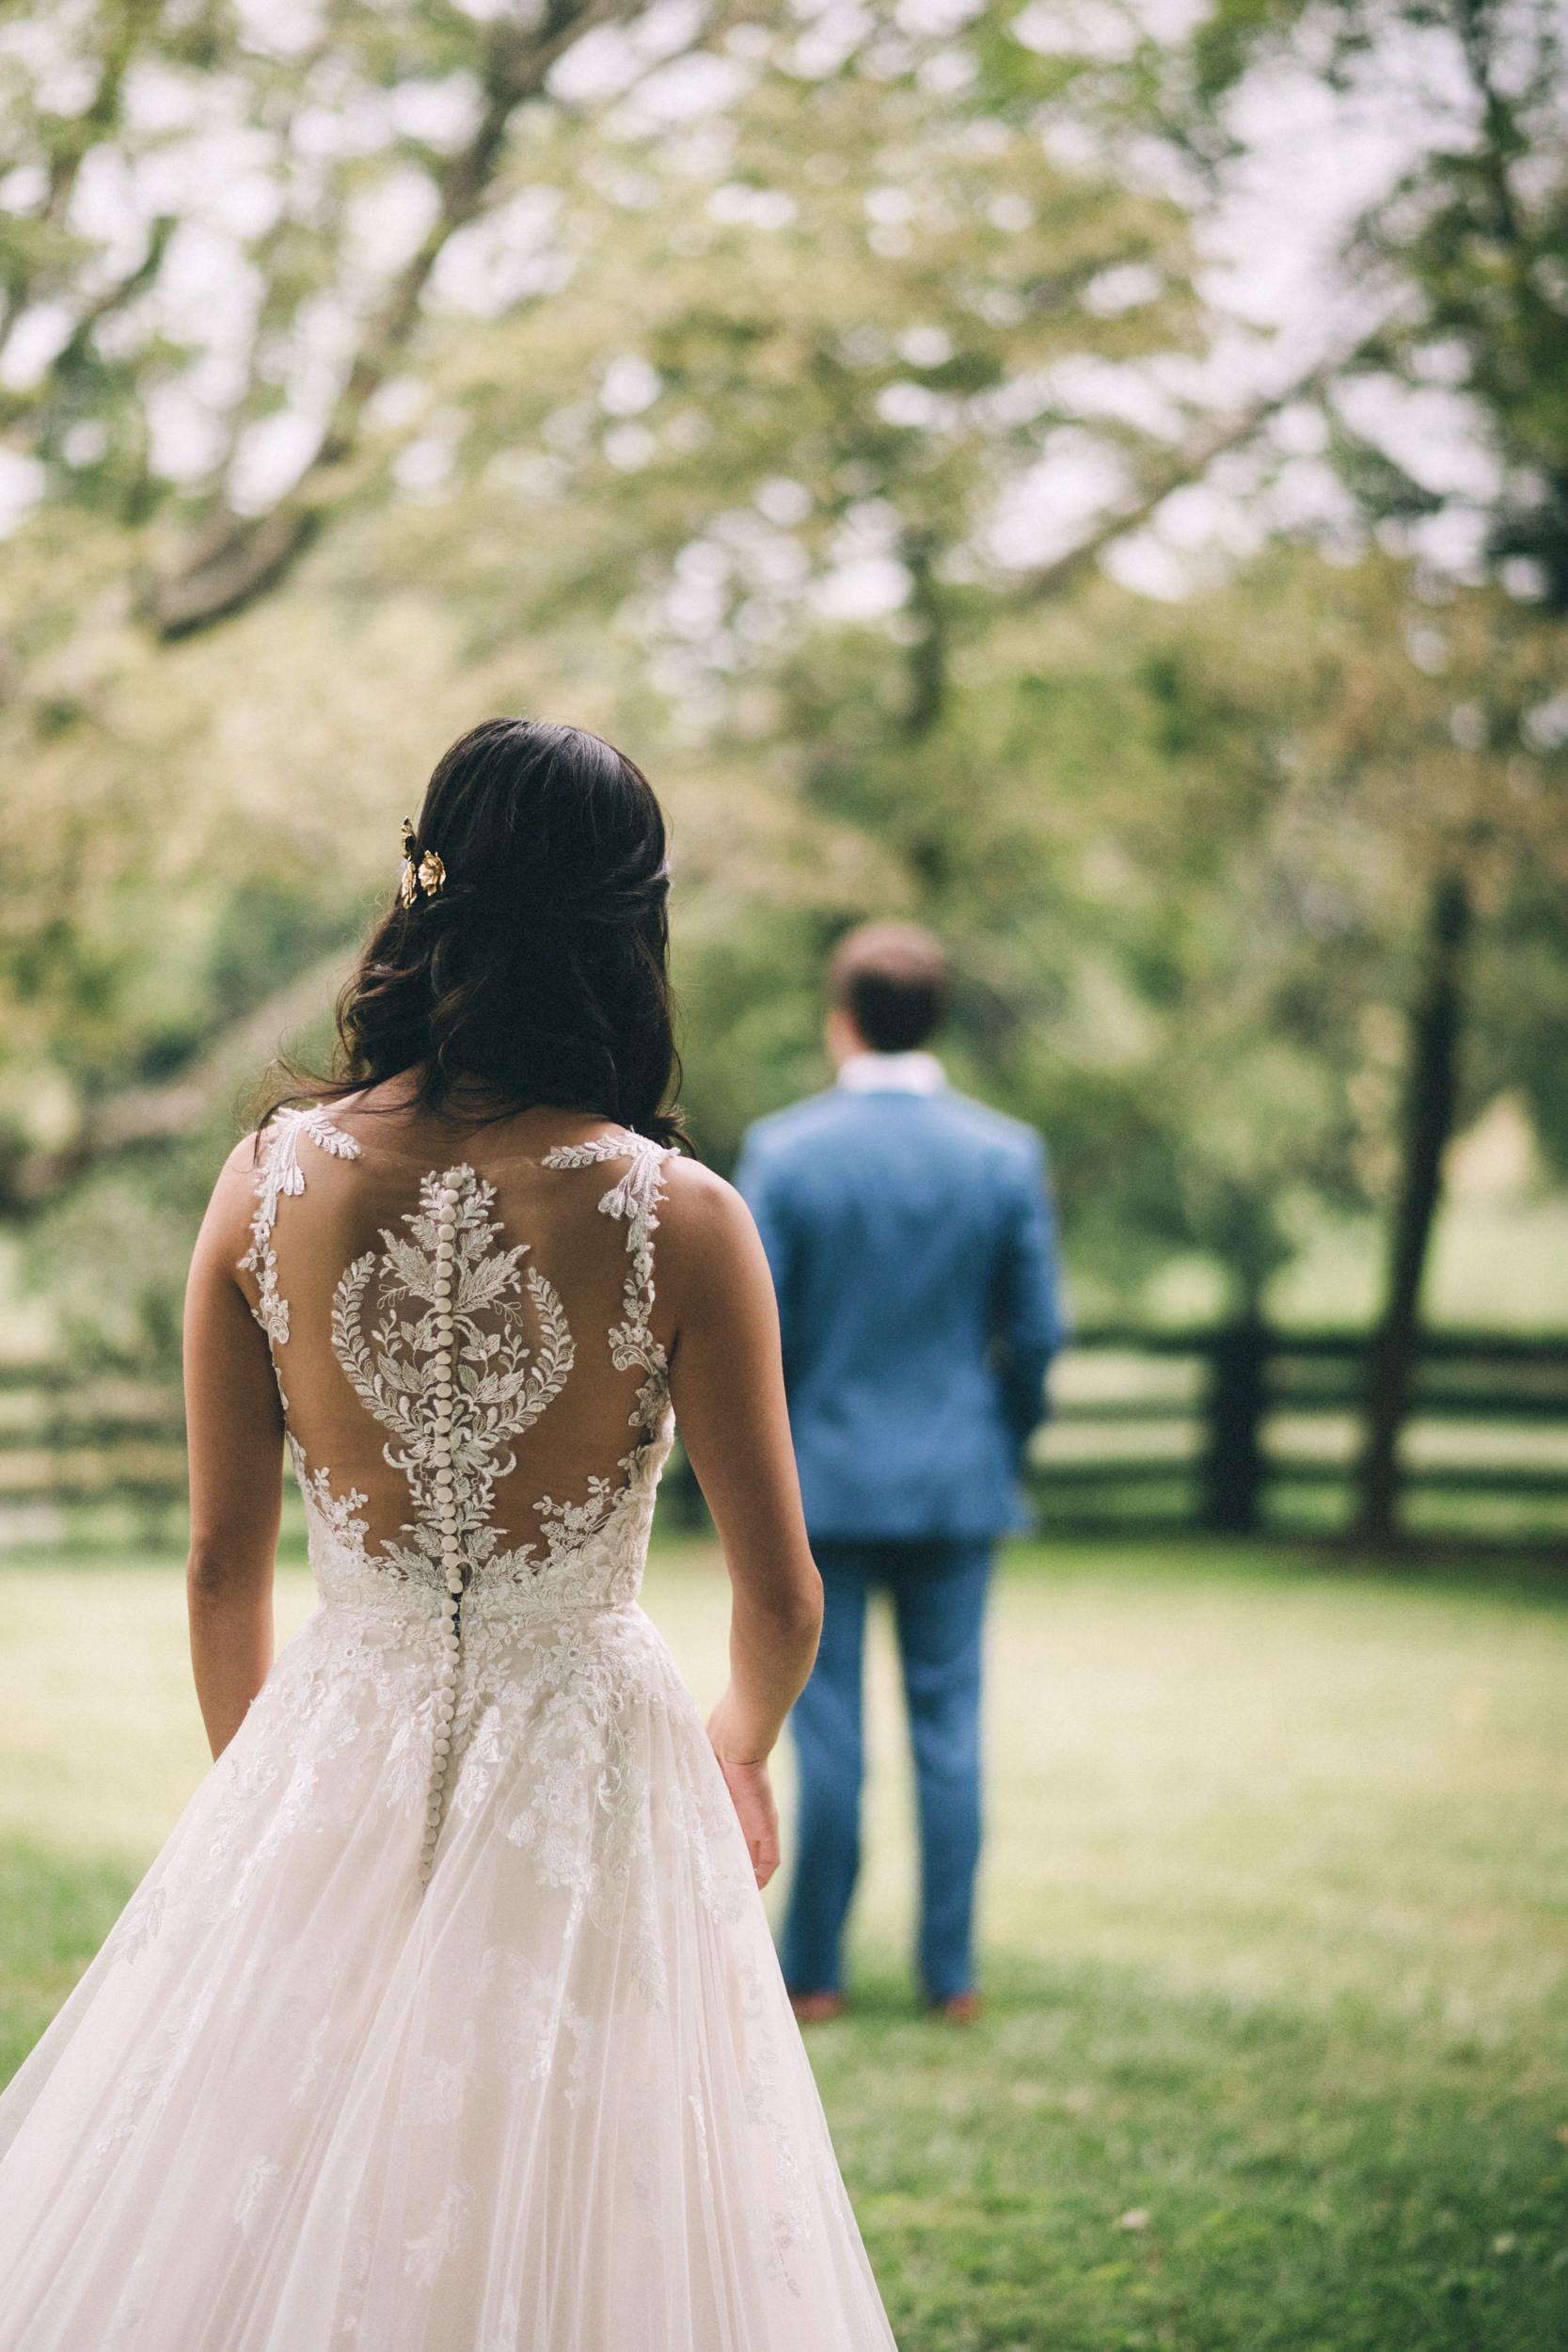 Louisville-Kentucky-Wedding-and-Elopement-Photographer-Sarah-Katherine-Davis-Photography-Summer-Jewel-Toned-Wedding-Chineese-Tea-Ceremony-Warrenwood-Manor-Danville-160.jpg